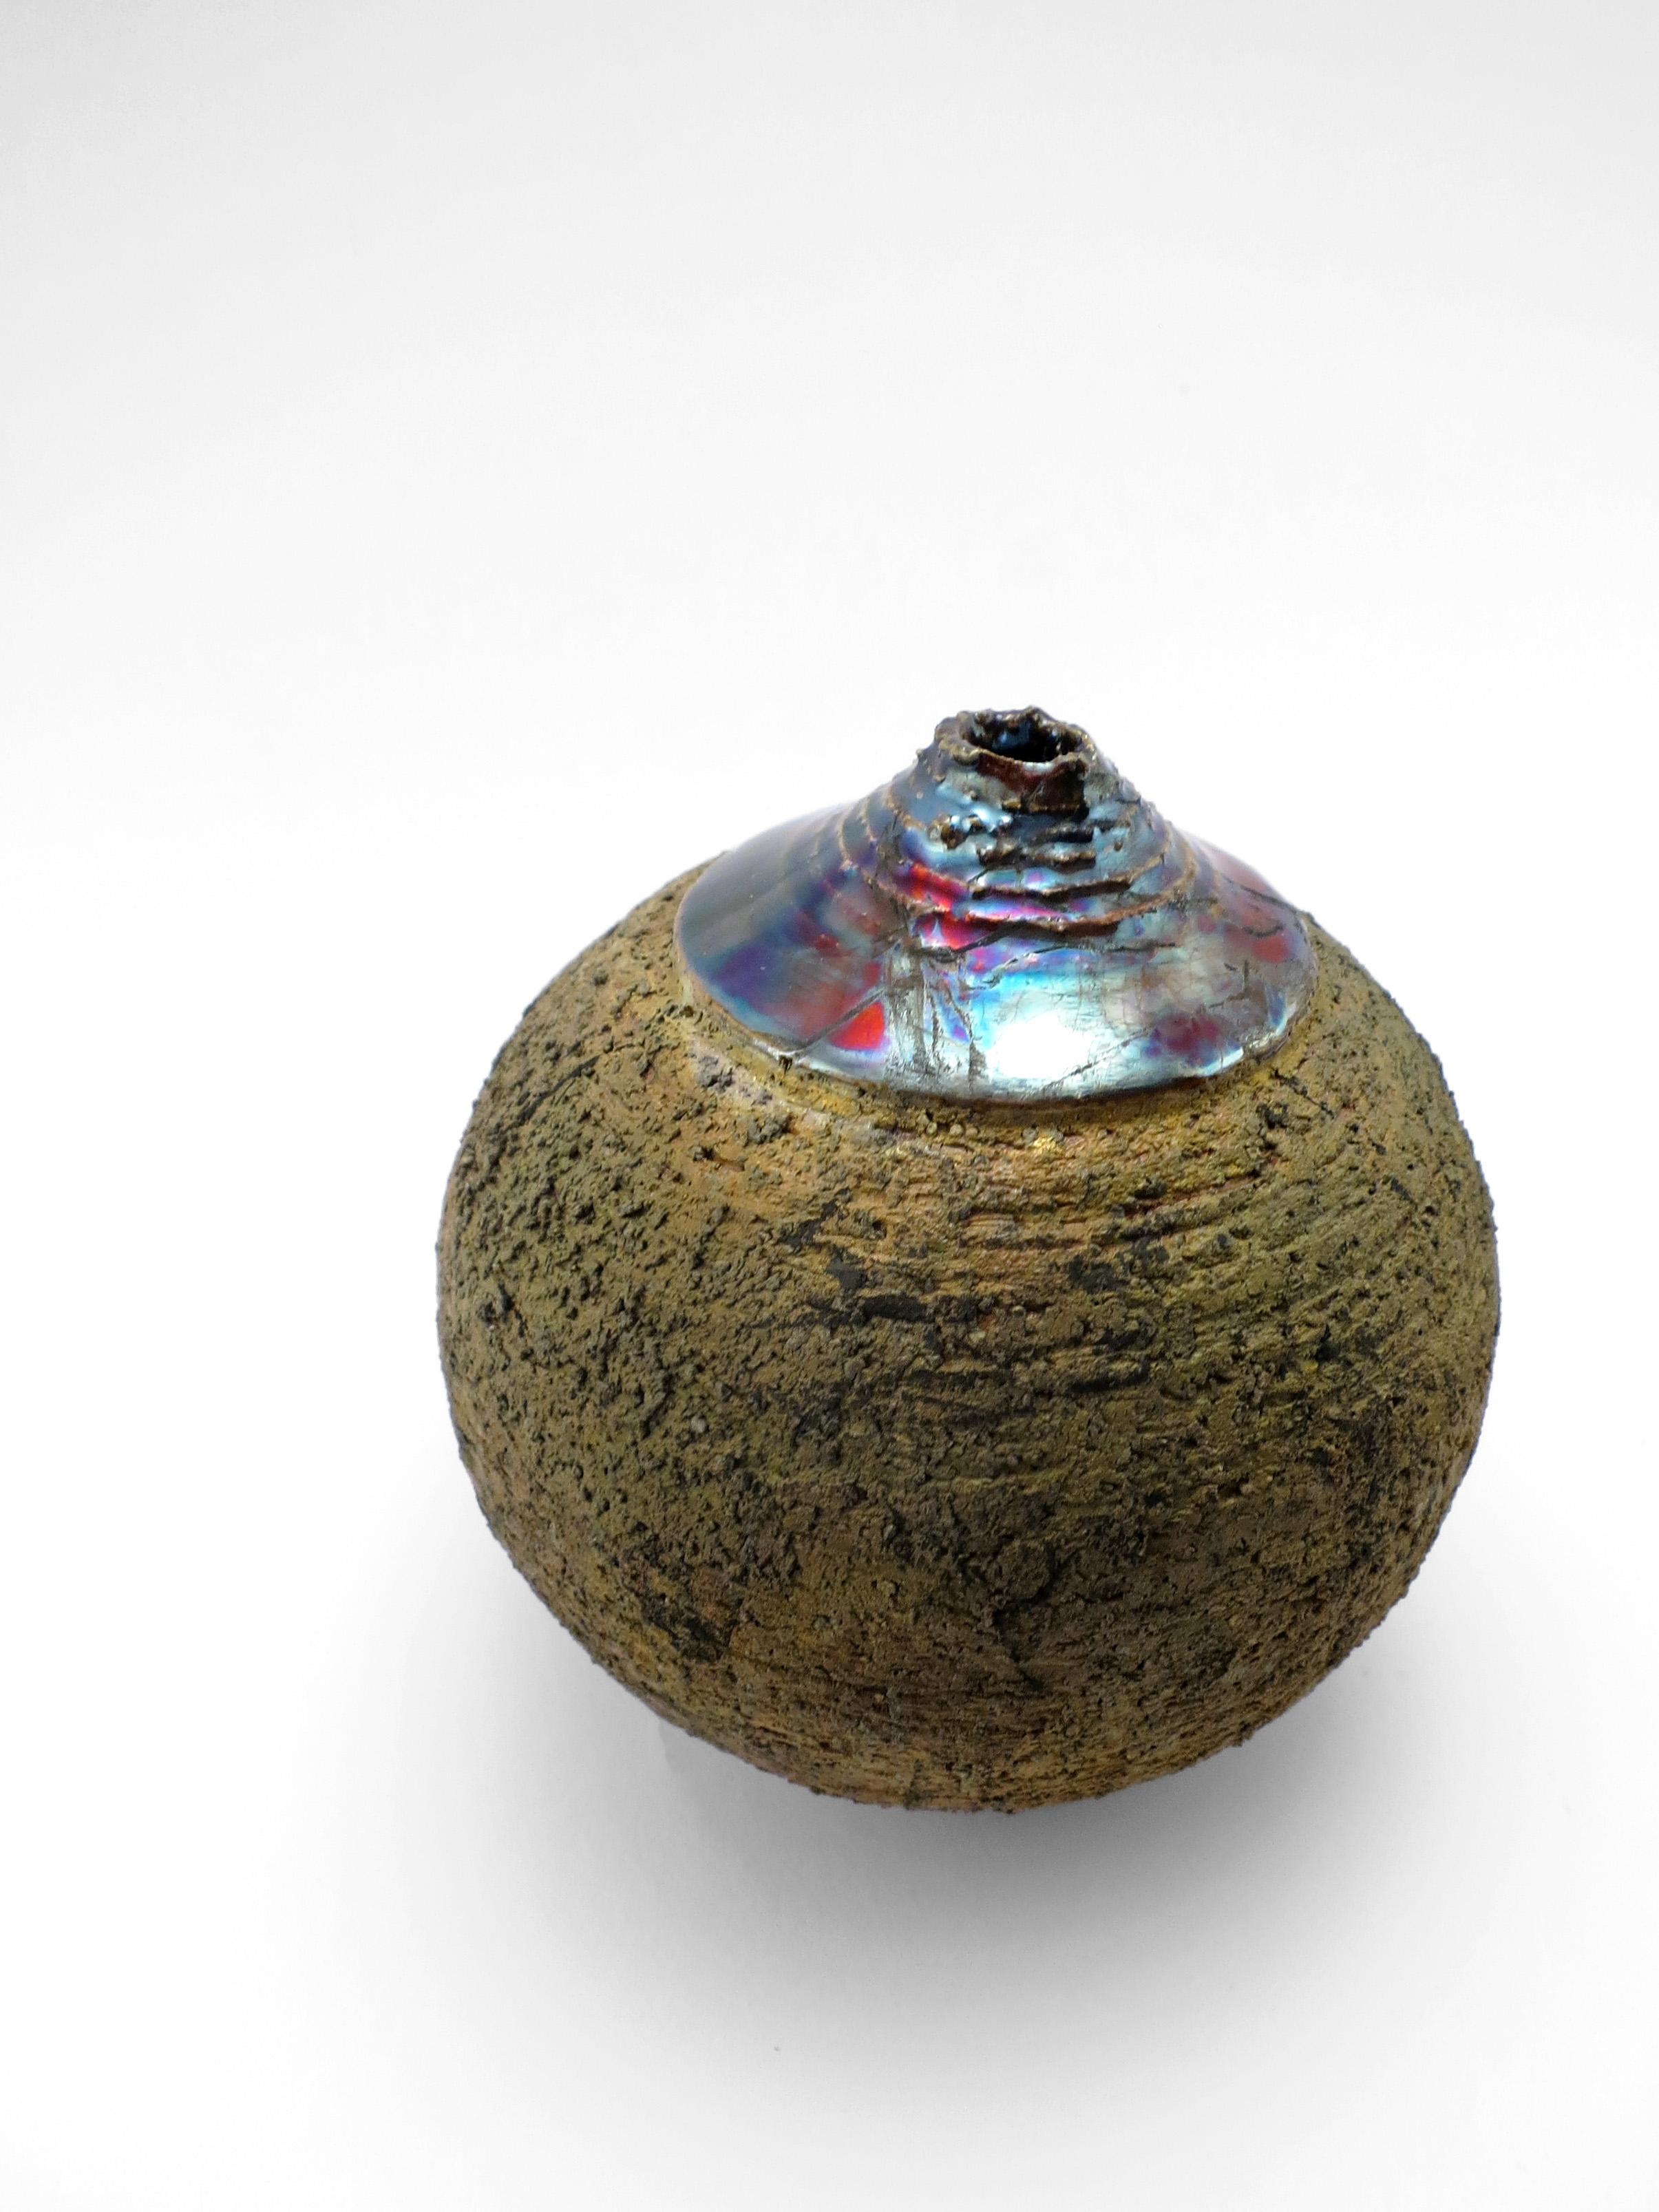 Glass Mountain: Whispering Globe - Ildikó Károlyi